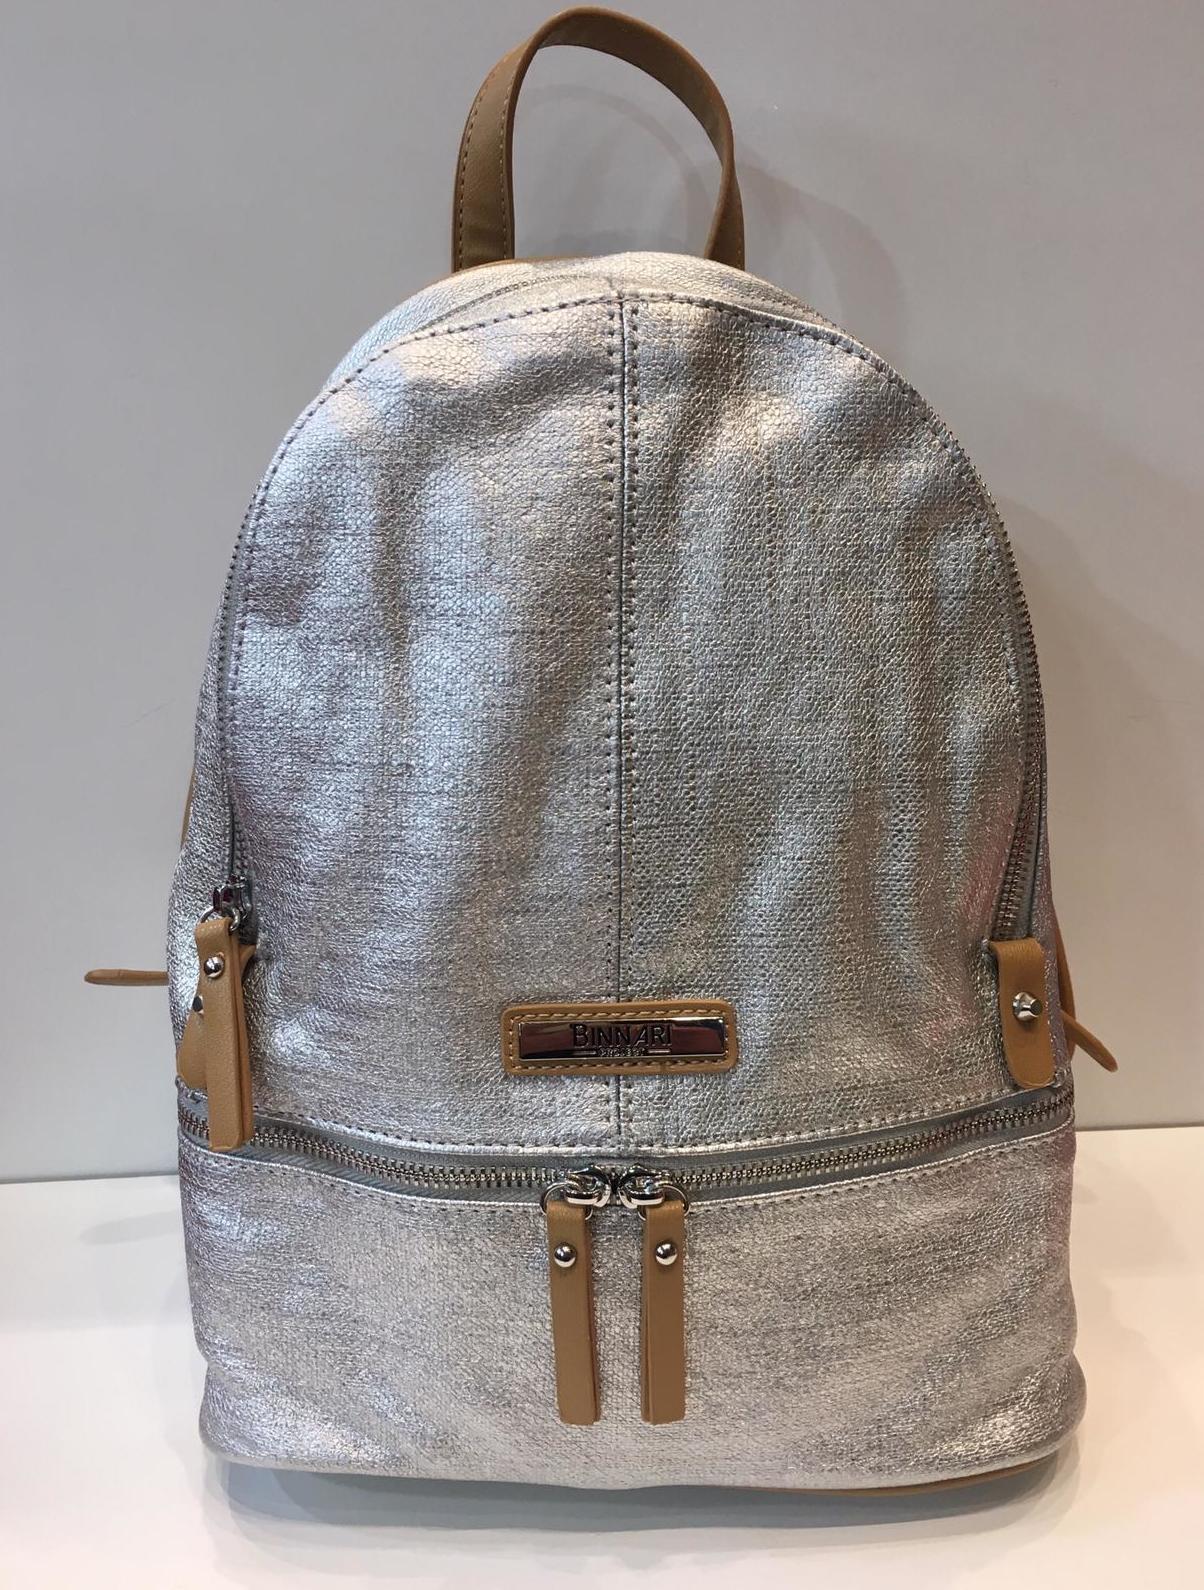 mochila plateada marca Binnari